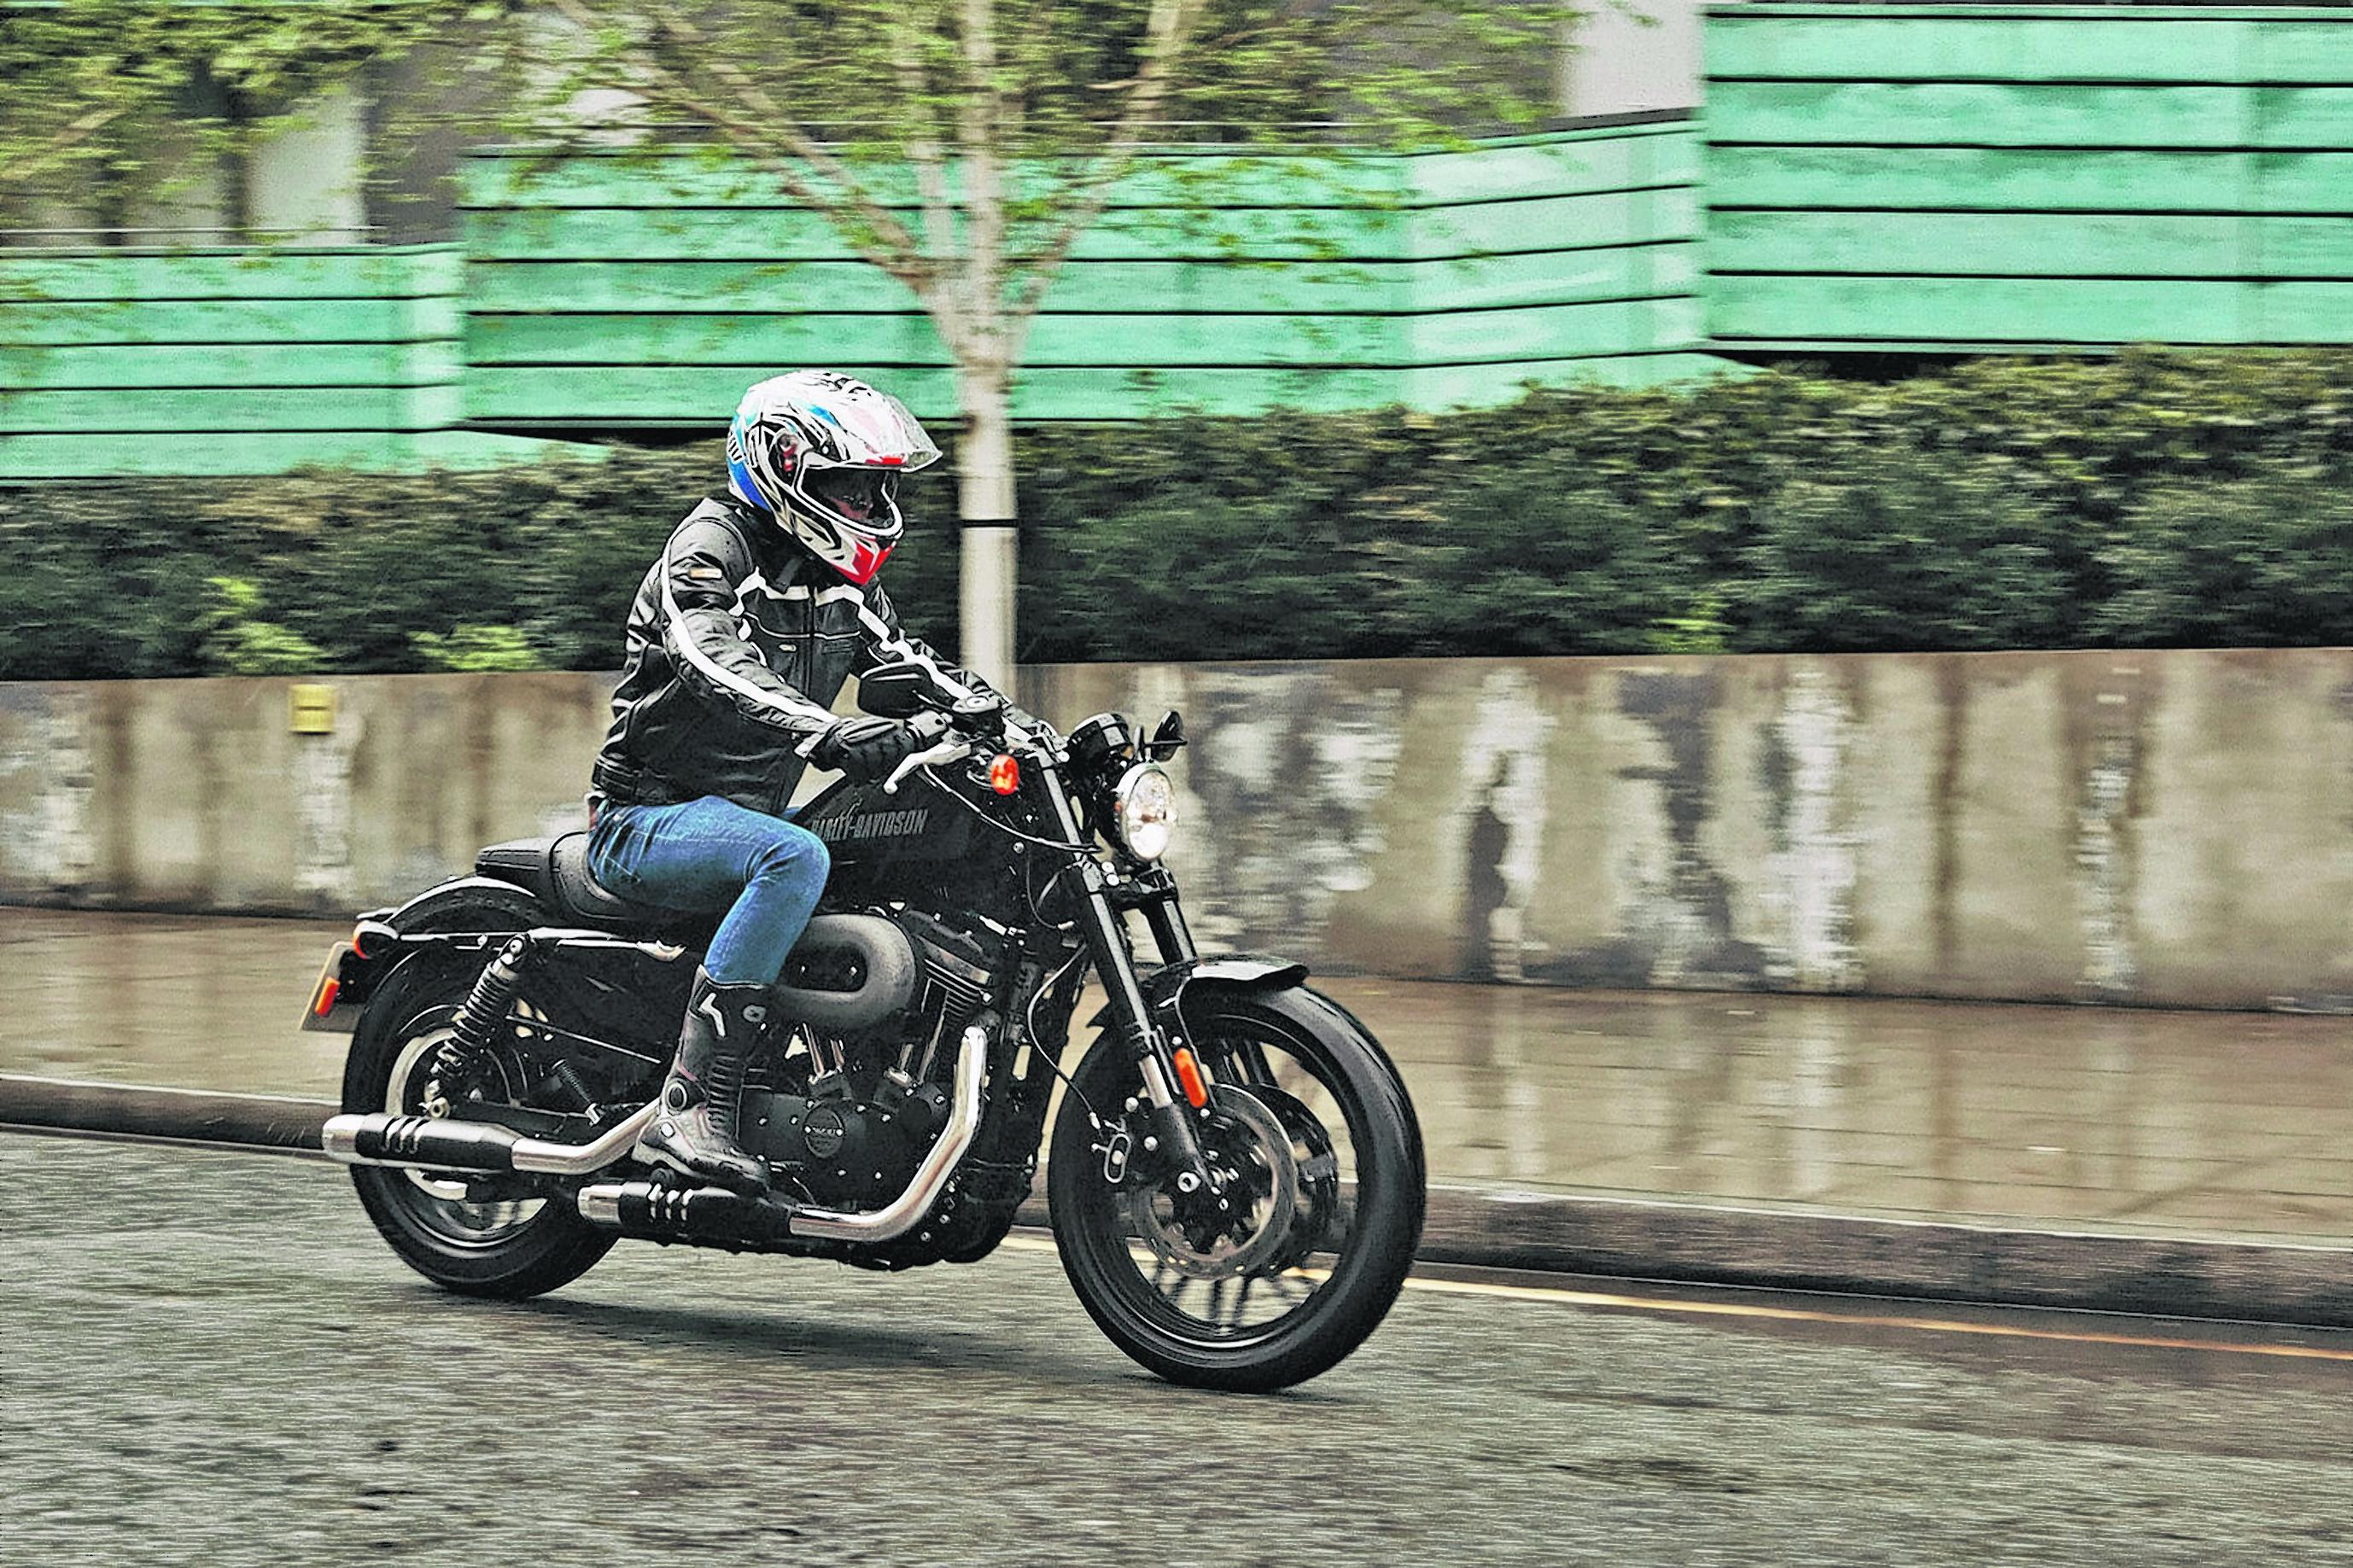 Matt Kimberley aboard the 2016 Harley-Davidson Roadster (James A. Grant/Harley-Davidson)